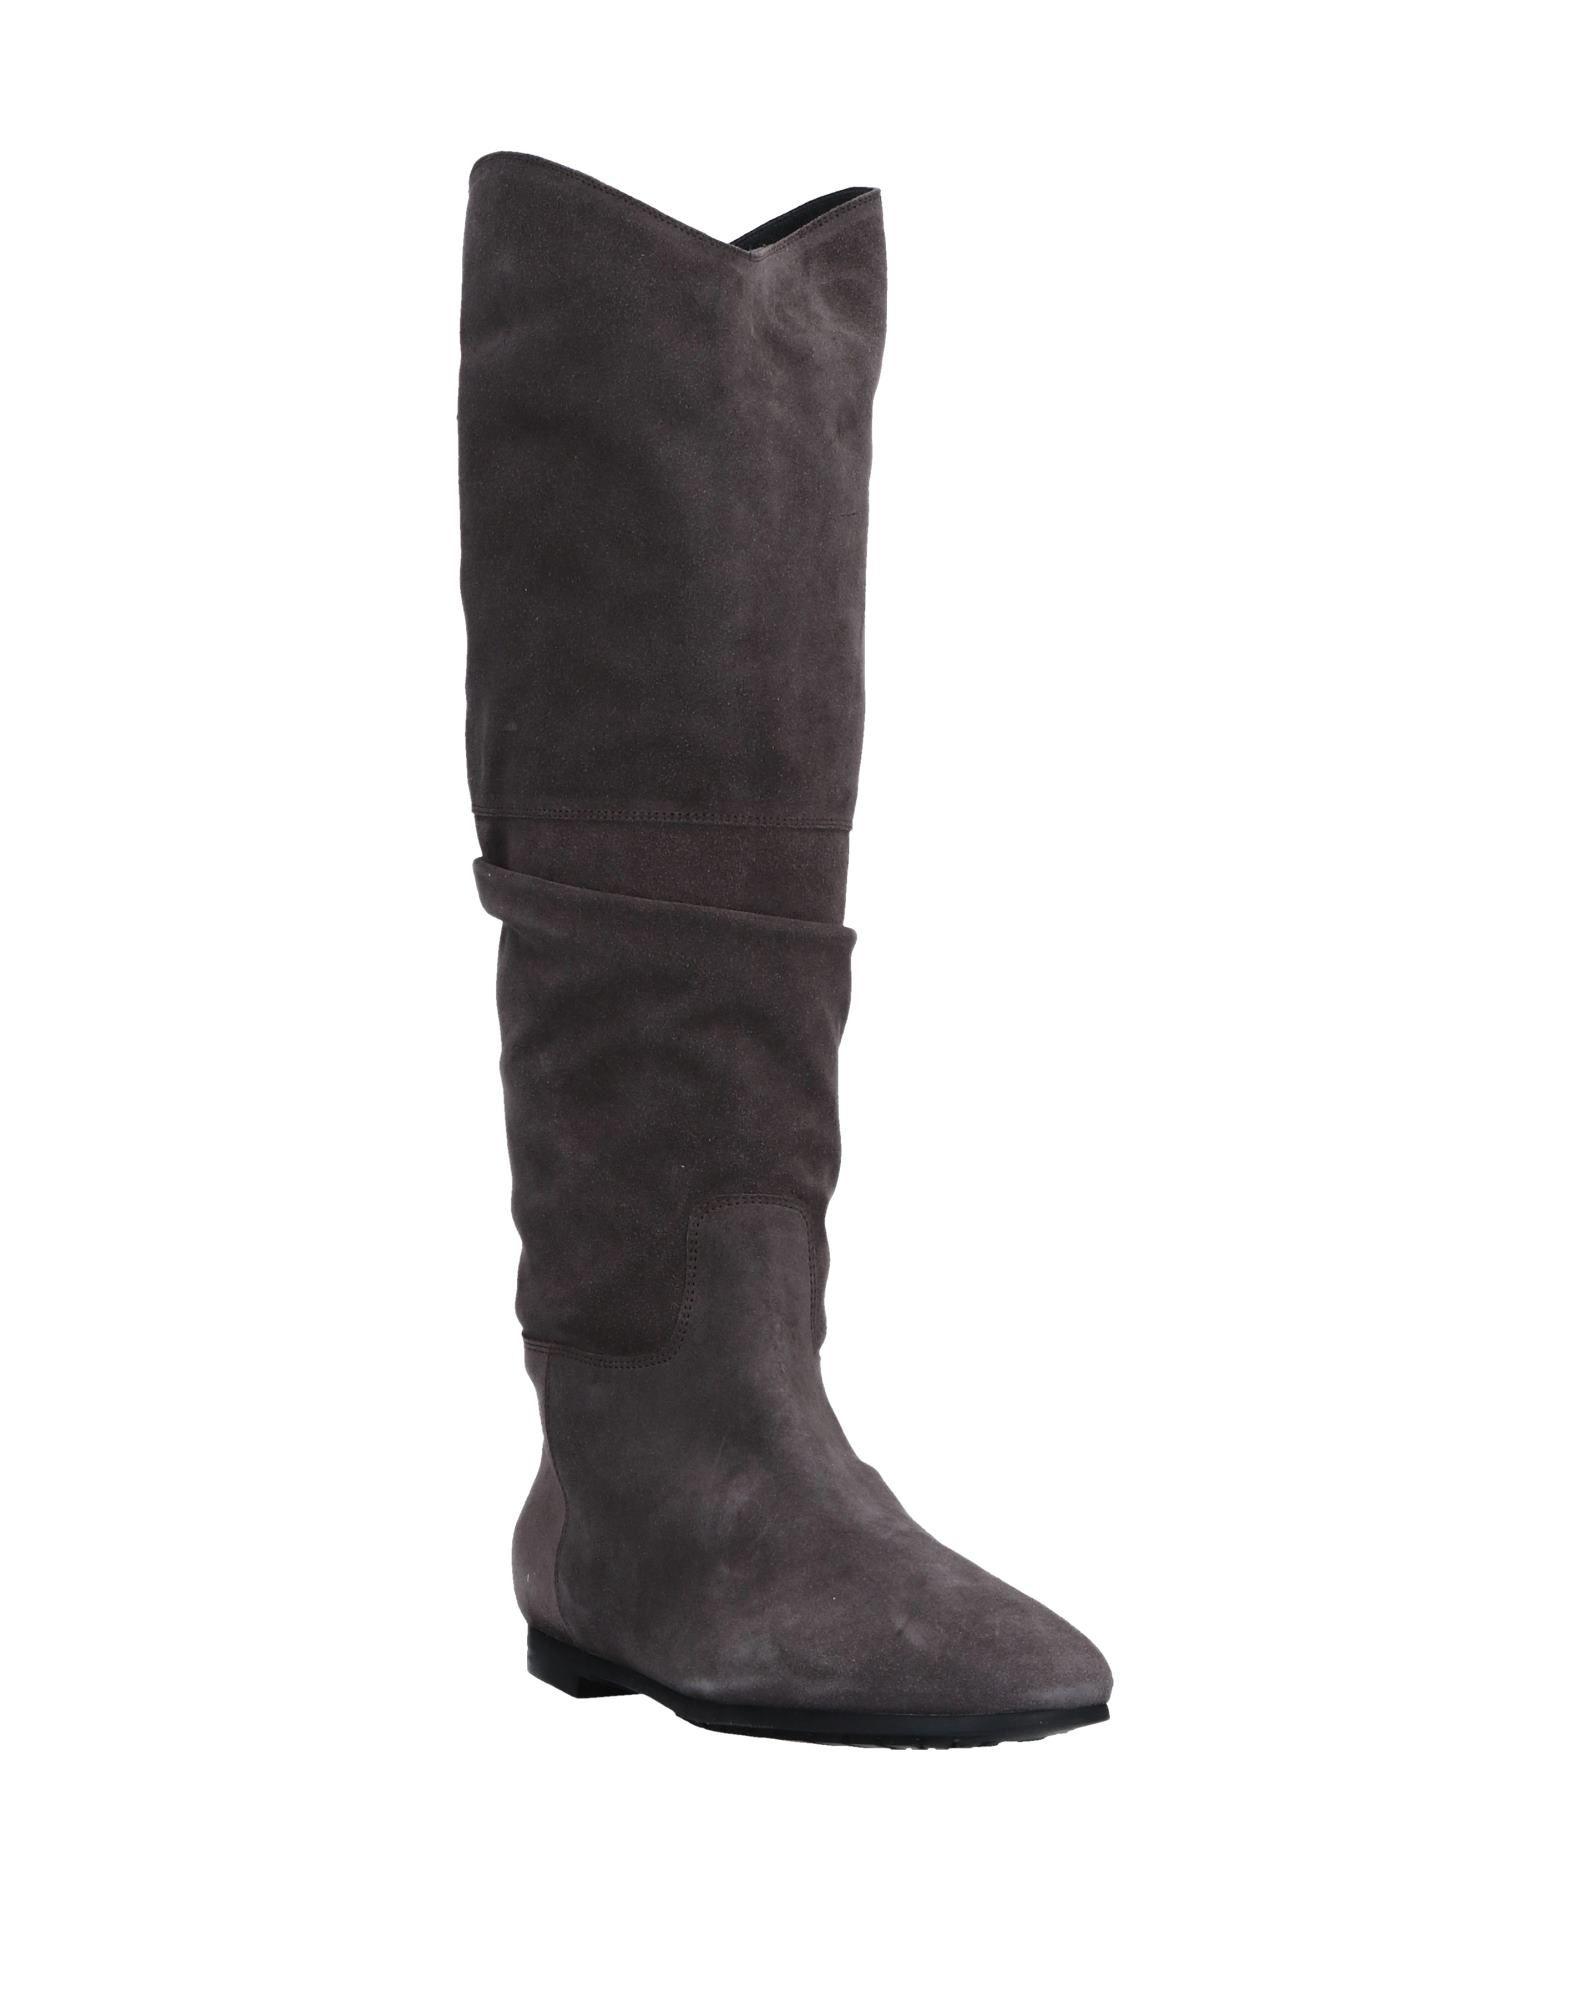 Miss L Boots - Women Women Women Miss L Boots online on  United Kingdom - 11526109DG a0c616